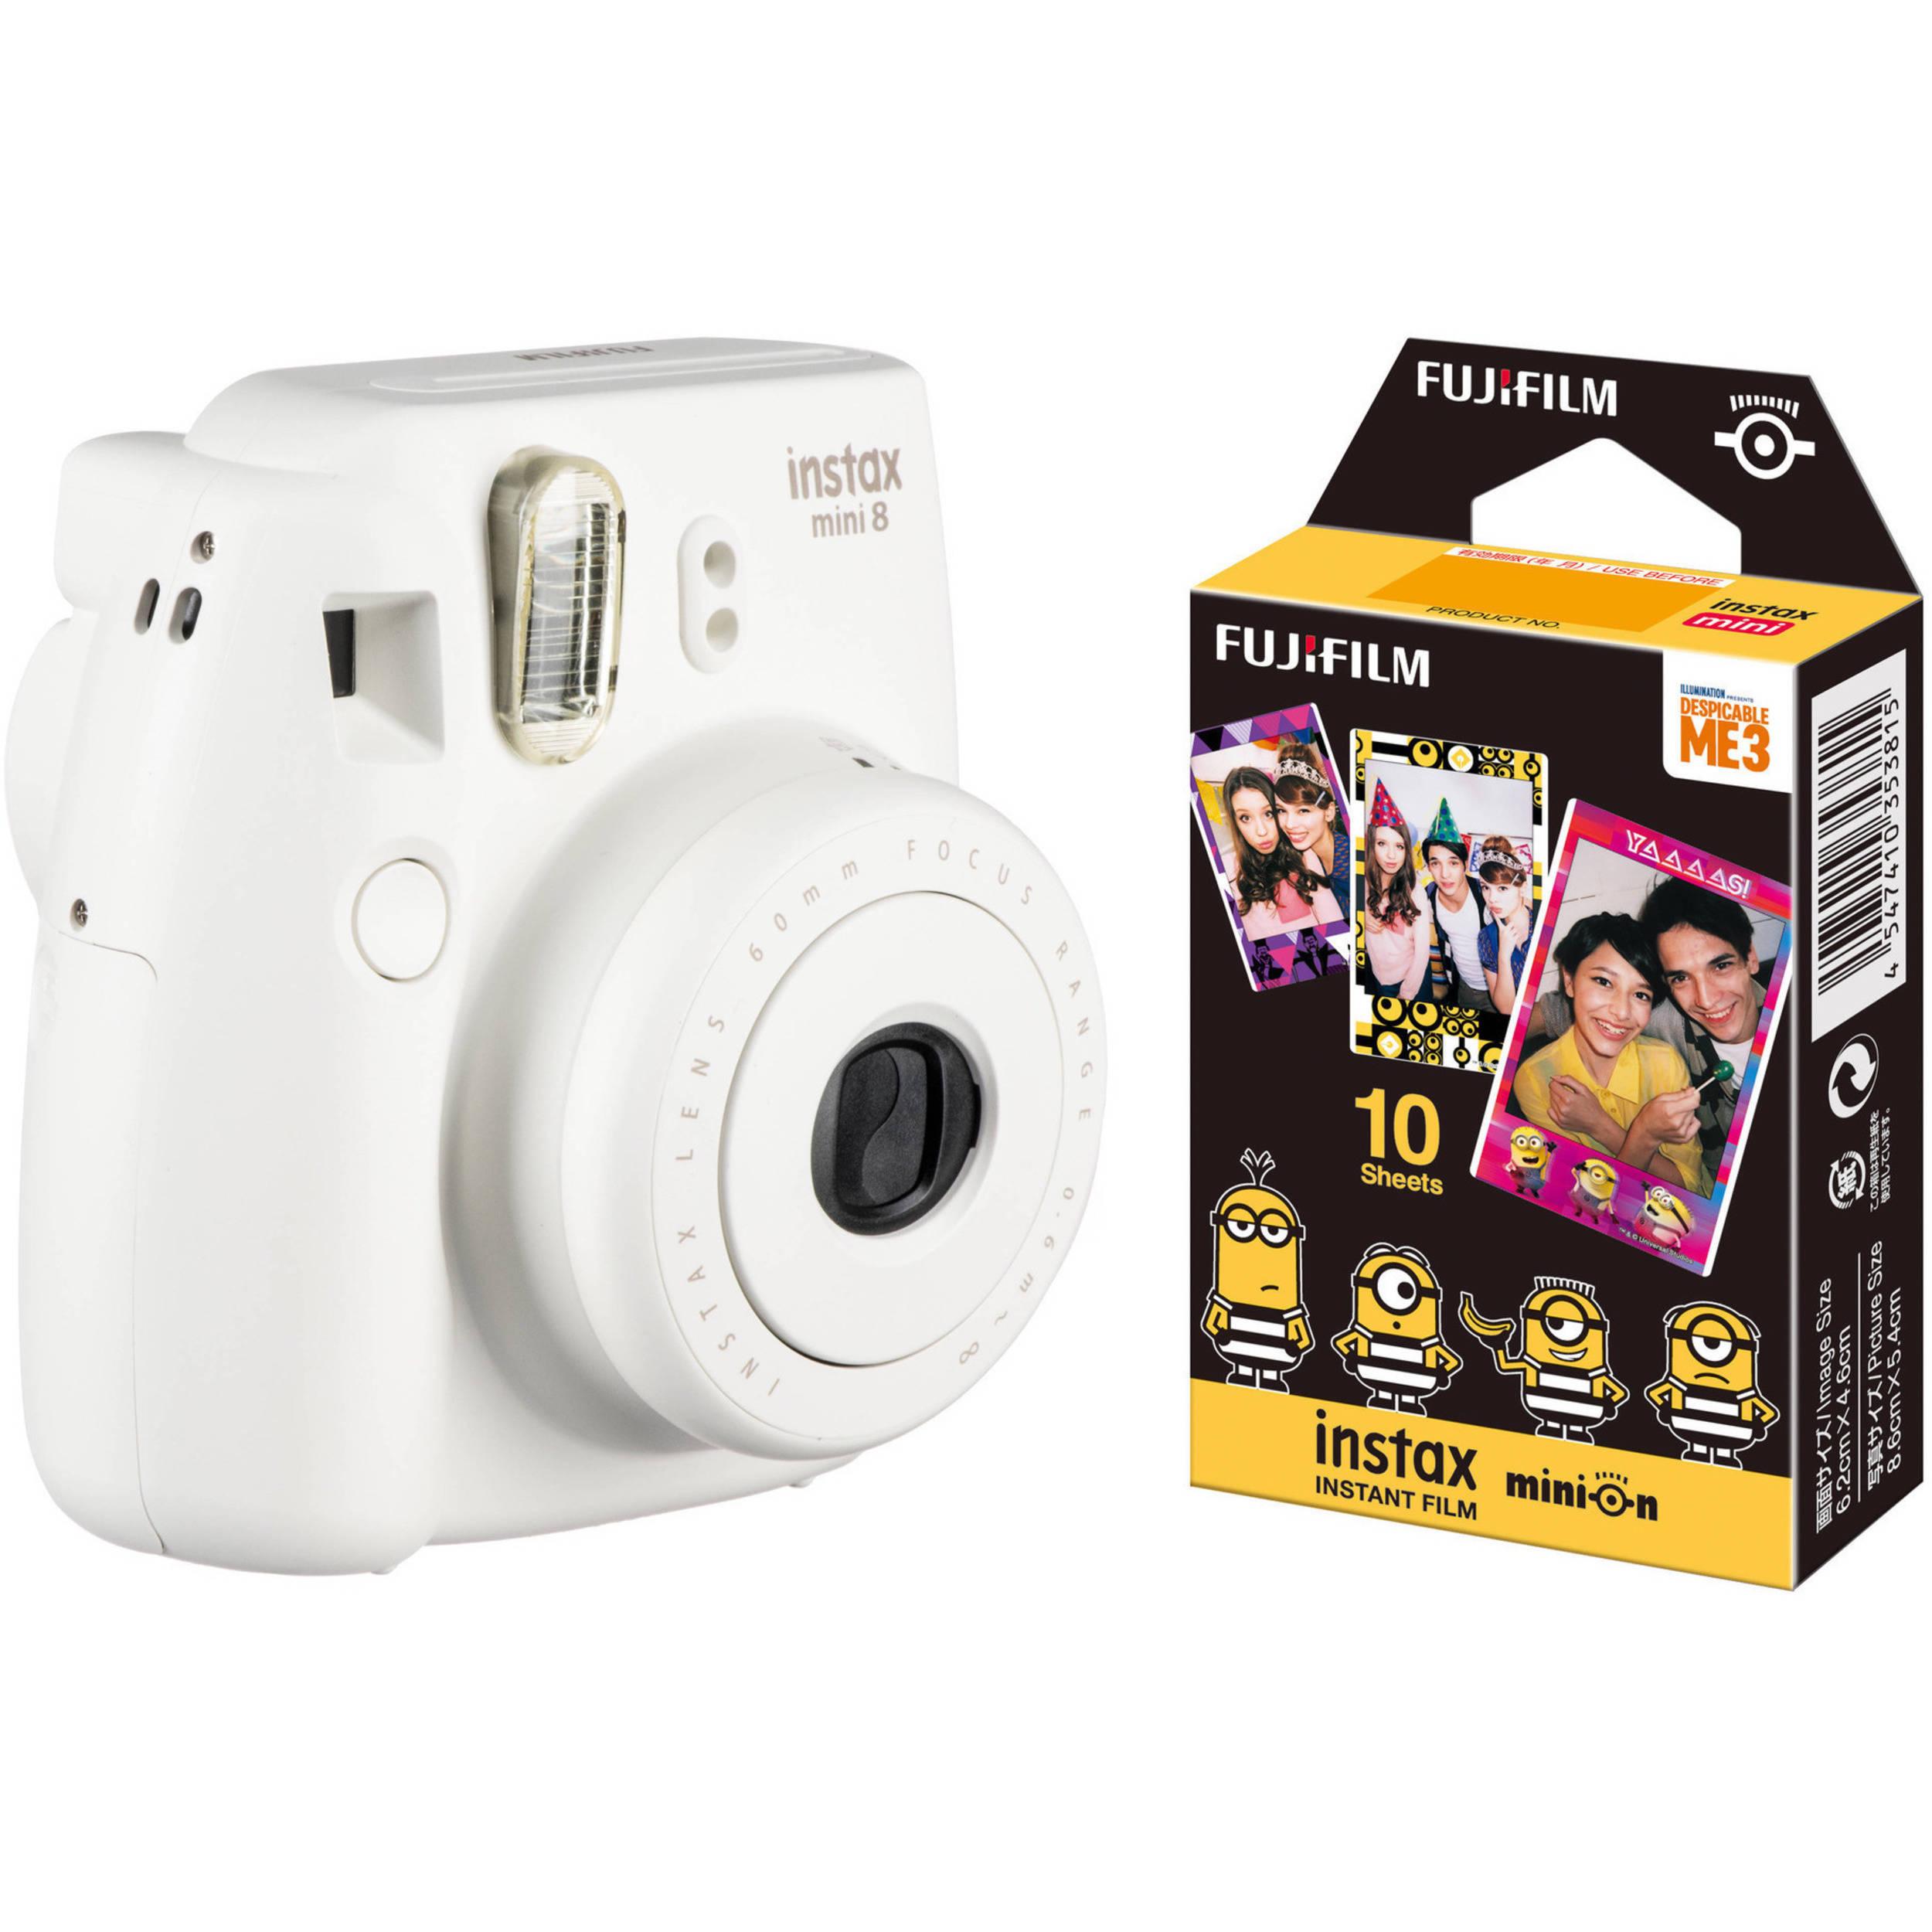 fujifilm instax mini 8 instant film camera with single pack of. Black Bedroom Furniture Sets. Home Design Ideas